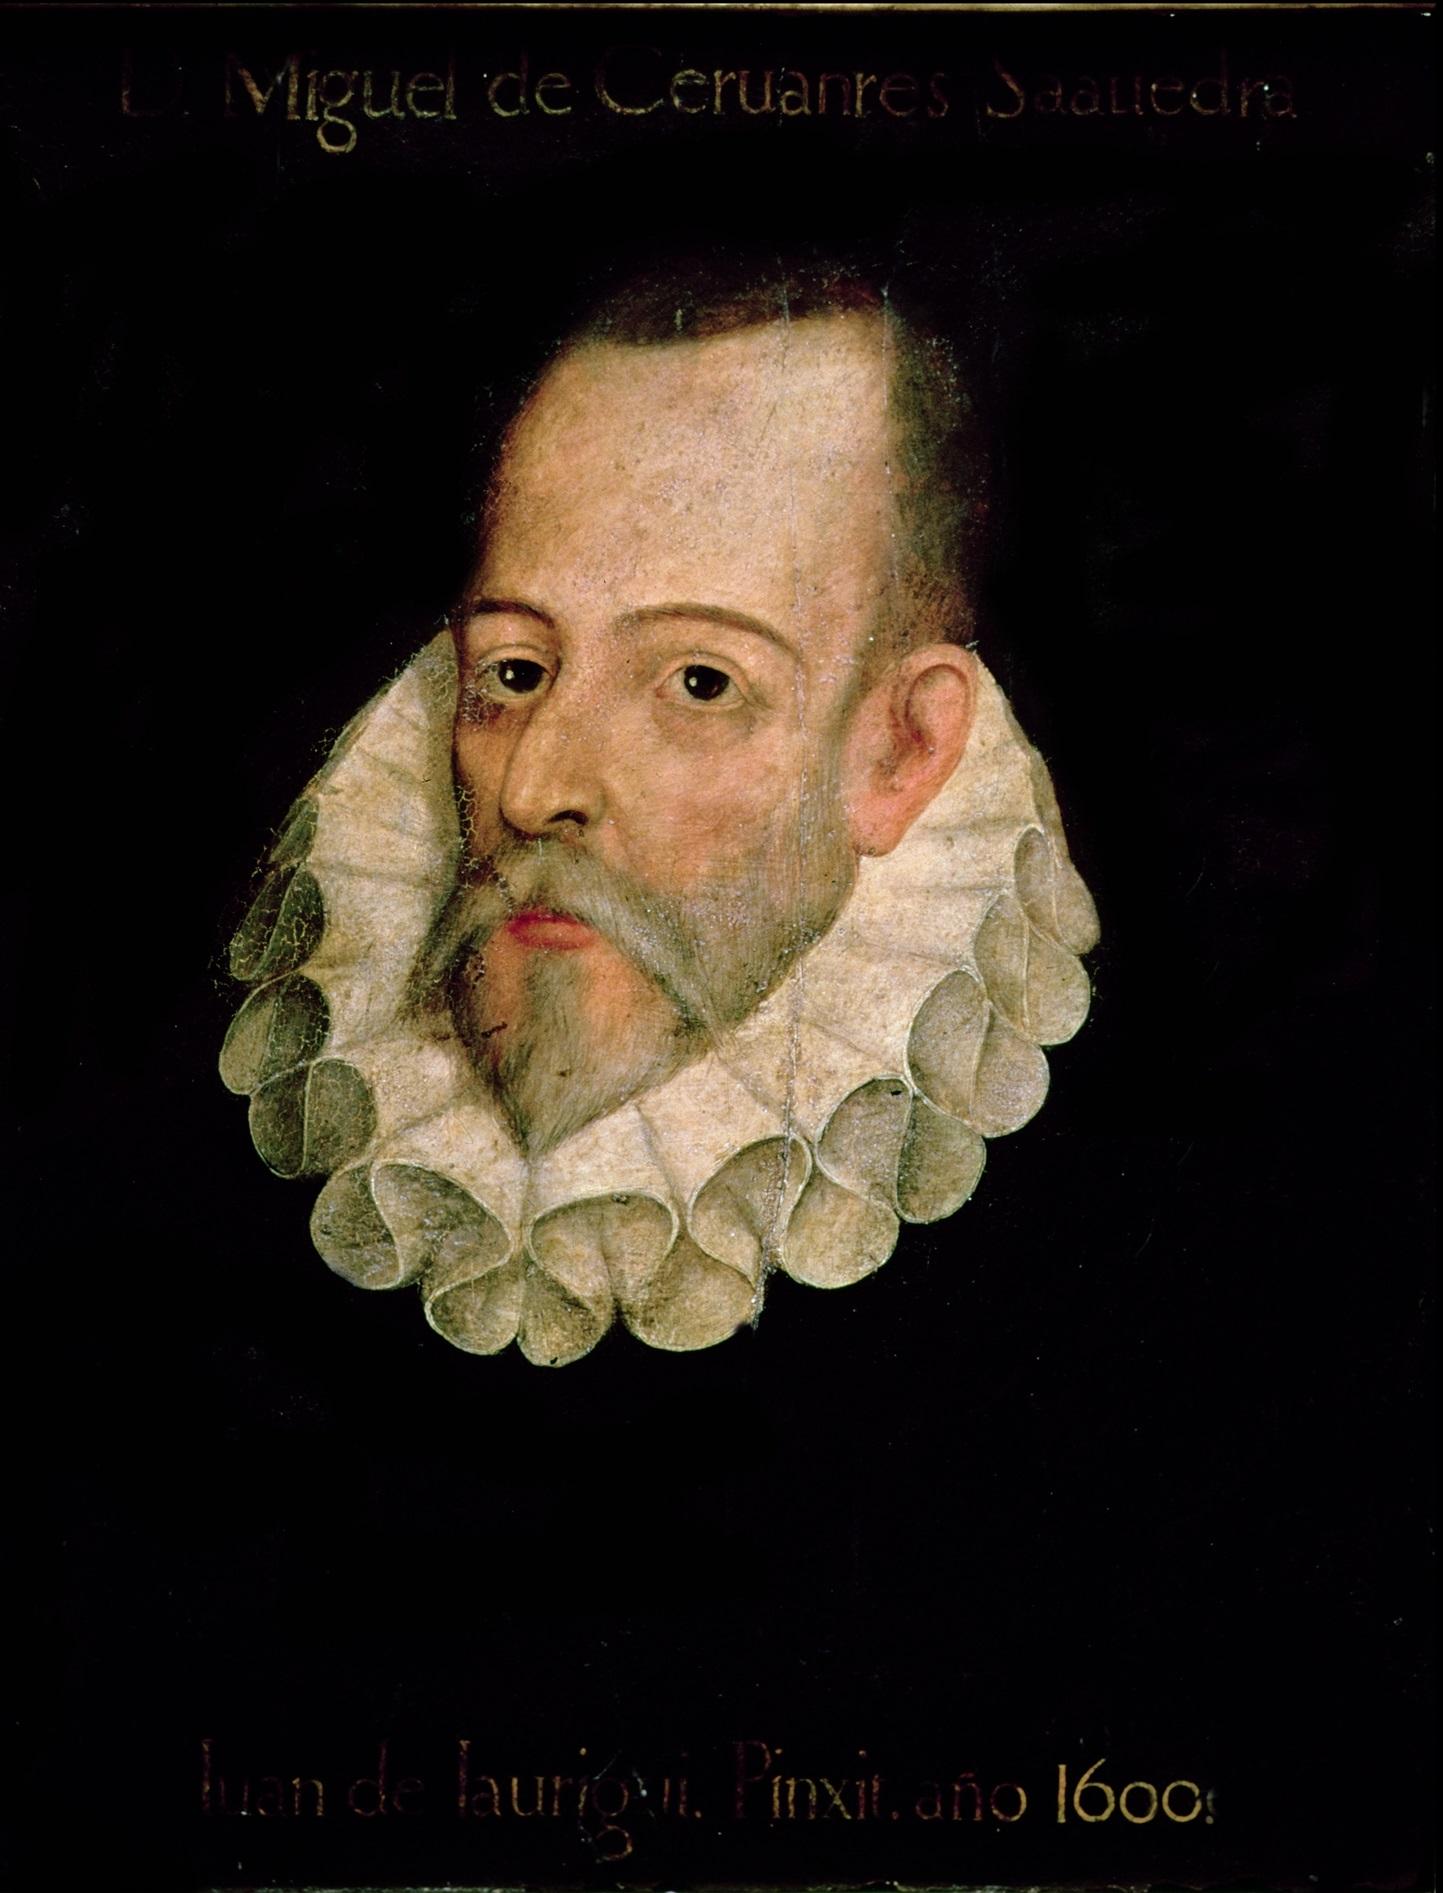 Retrato no oficial de Cervantes, Juan de Jáuregui